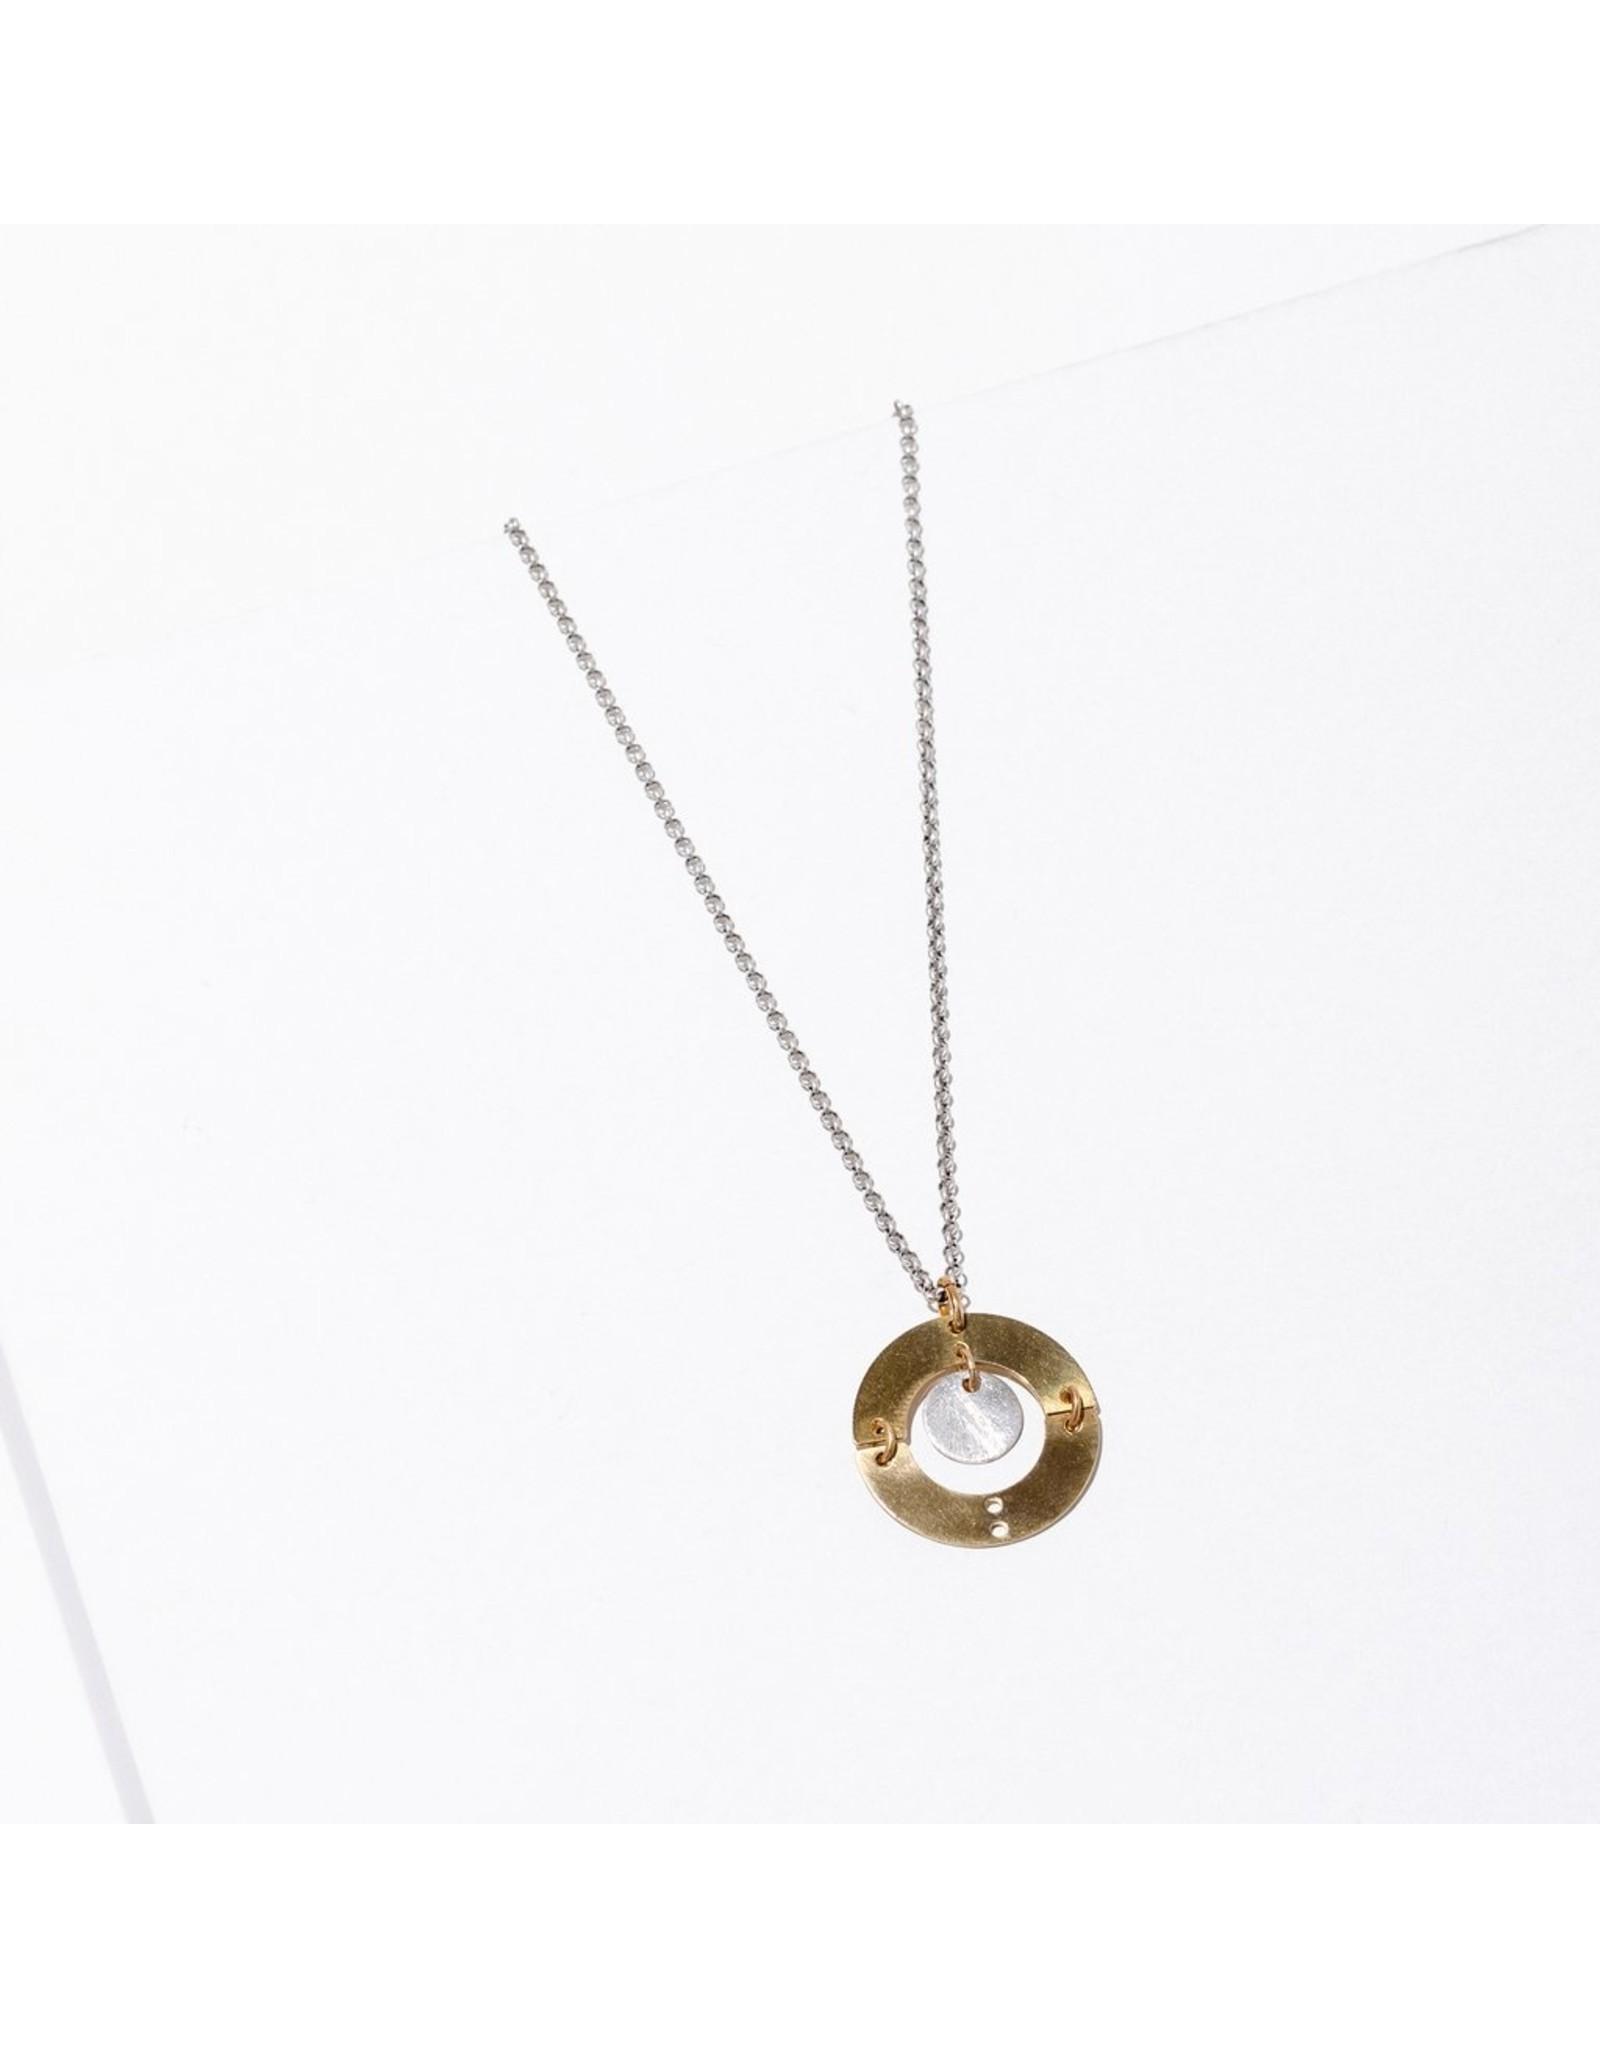 Larissa Loden Puer necklace